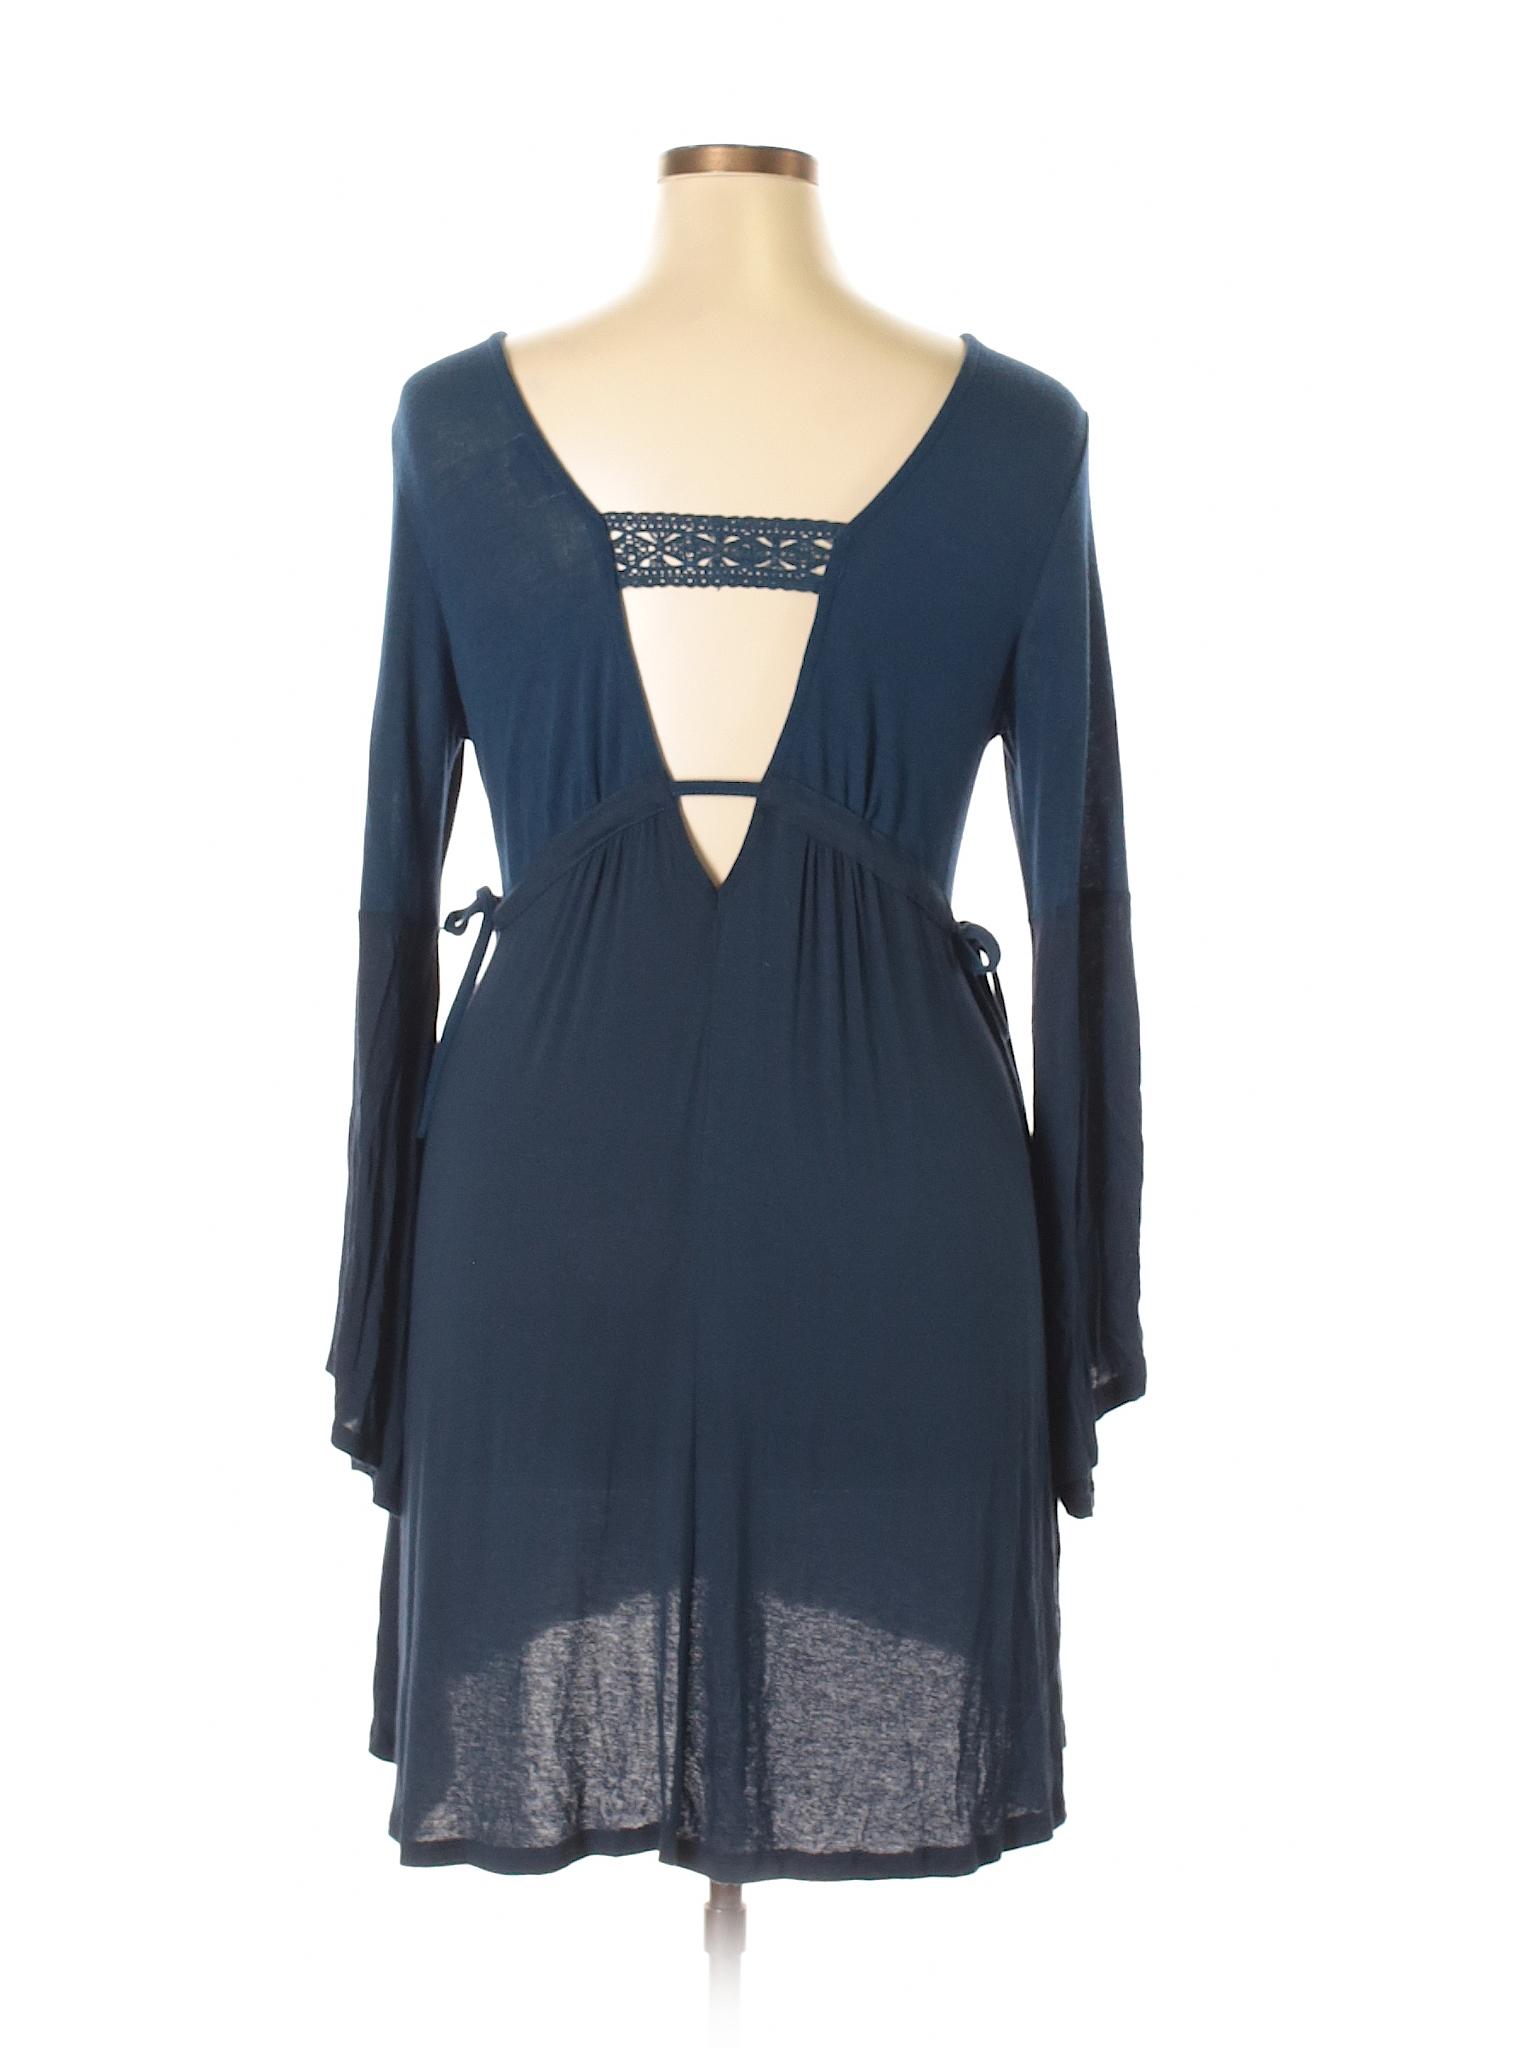 Selling Anama Casual Casual Anama Dress Anama Selling Dress Selling XdZwq